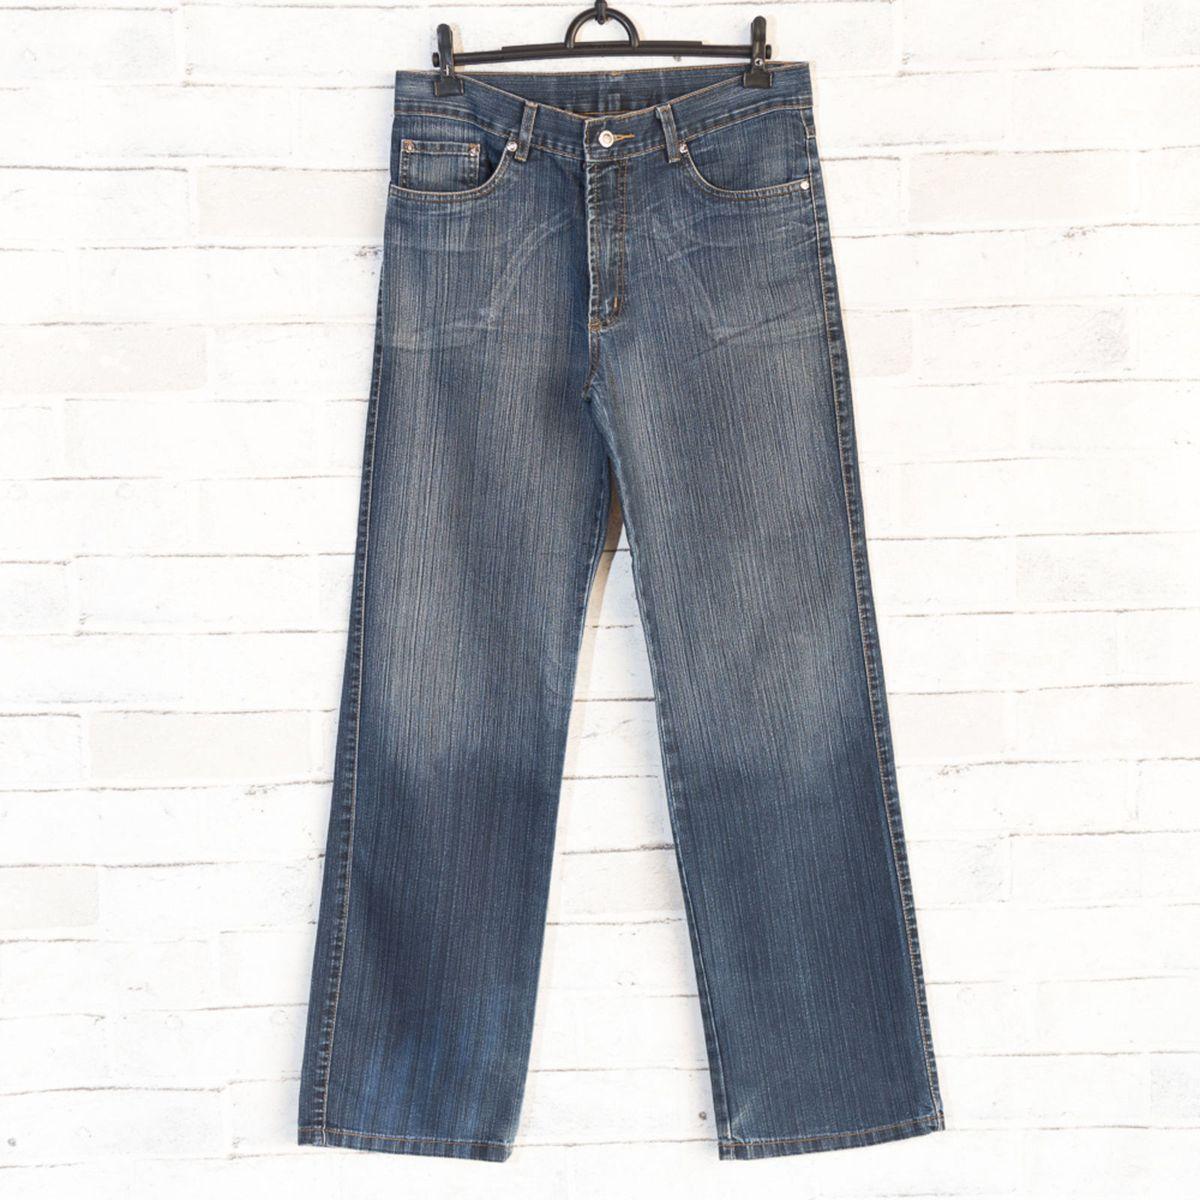 00fb6026b11 Calça Jeans Masculina Tradicional